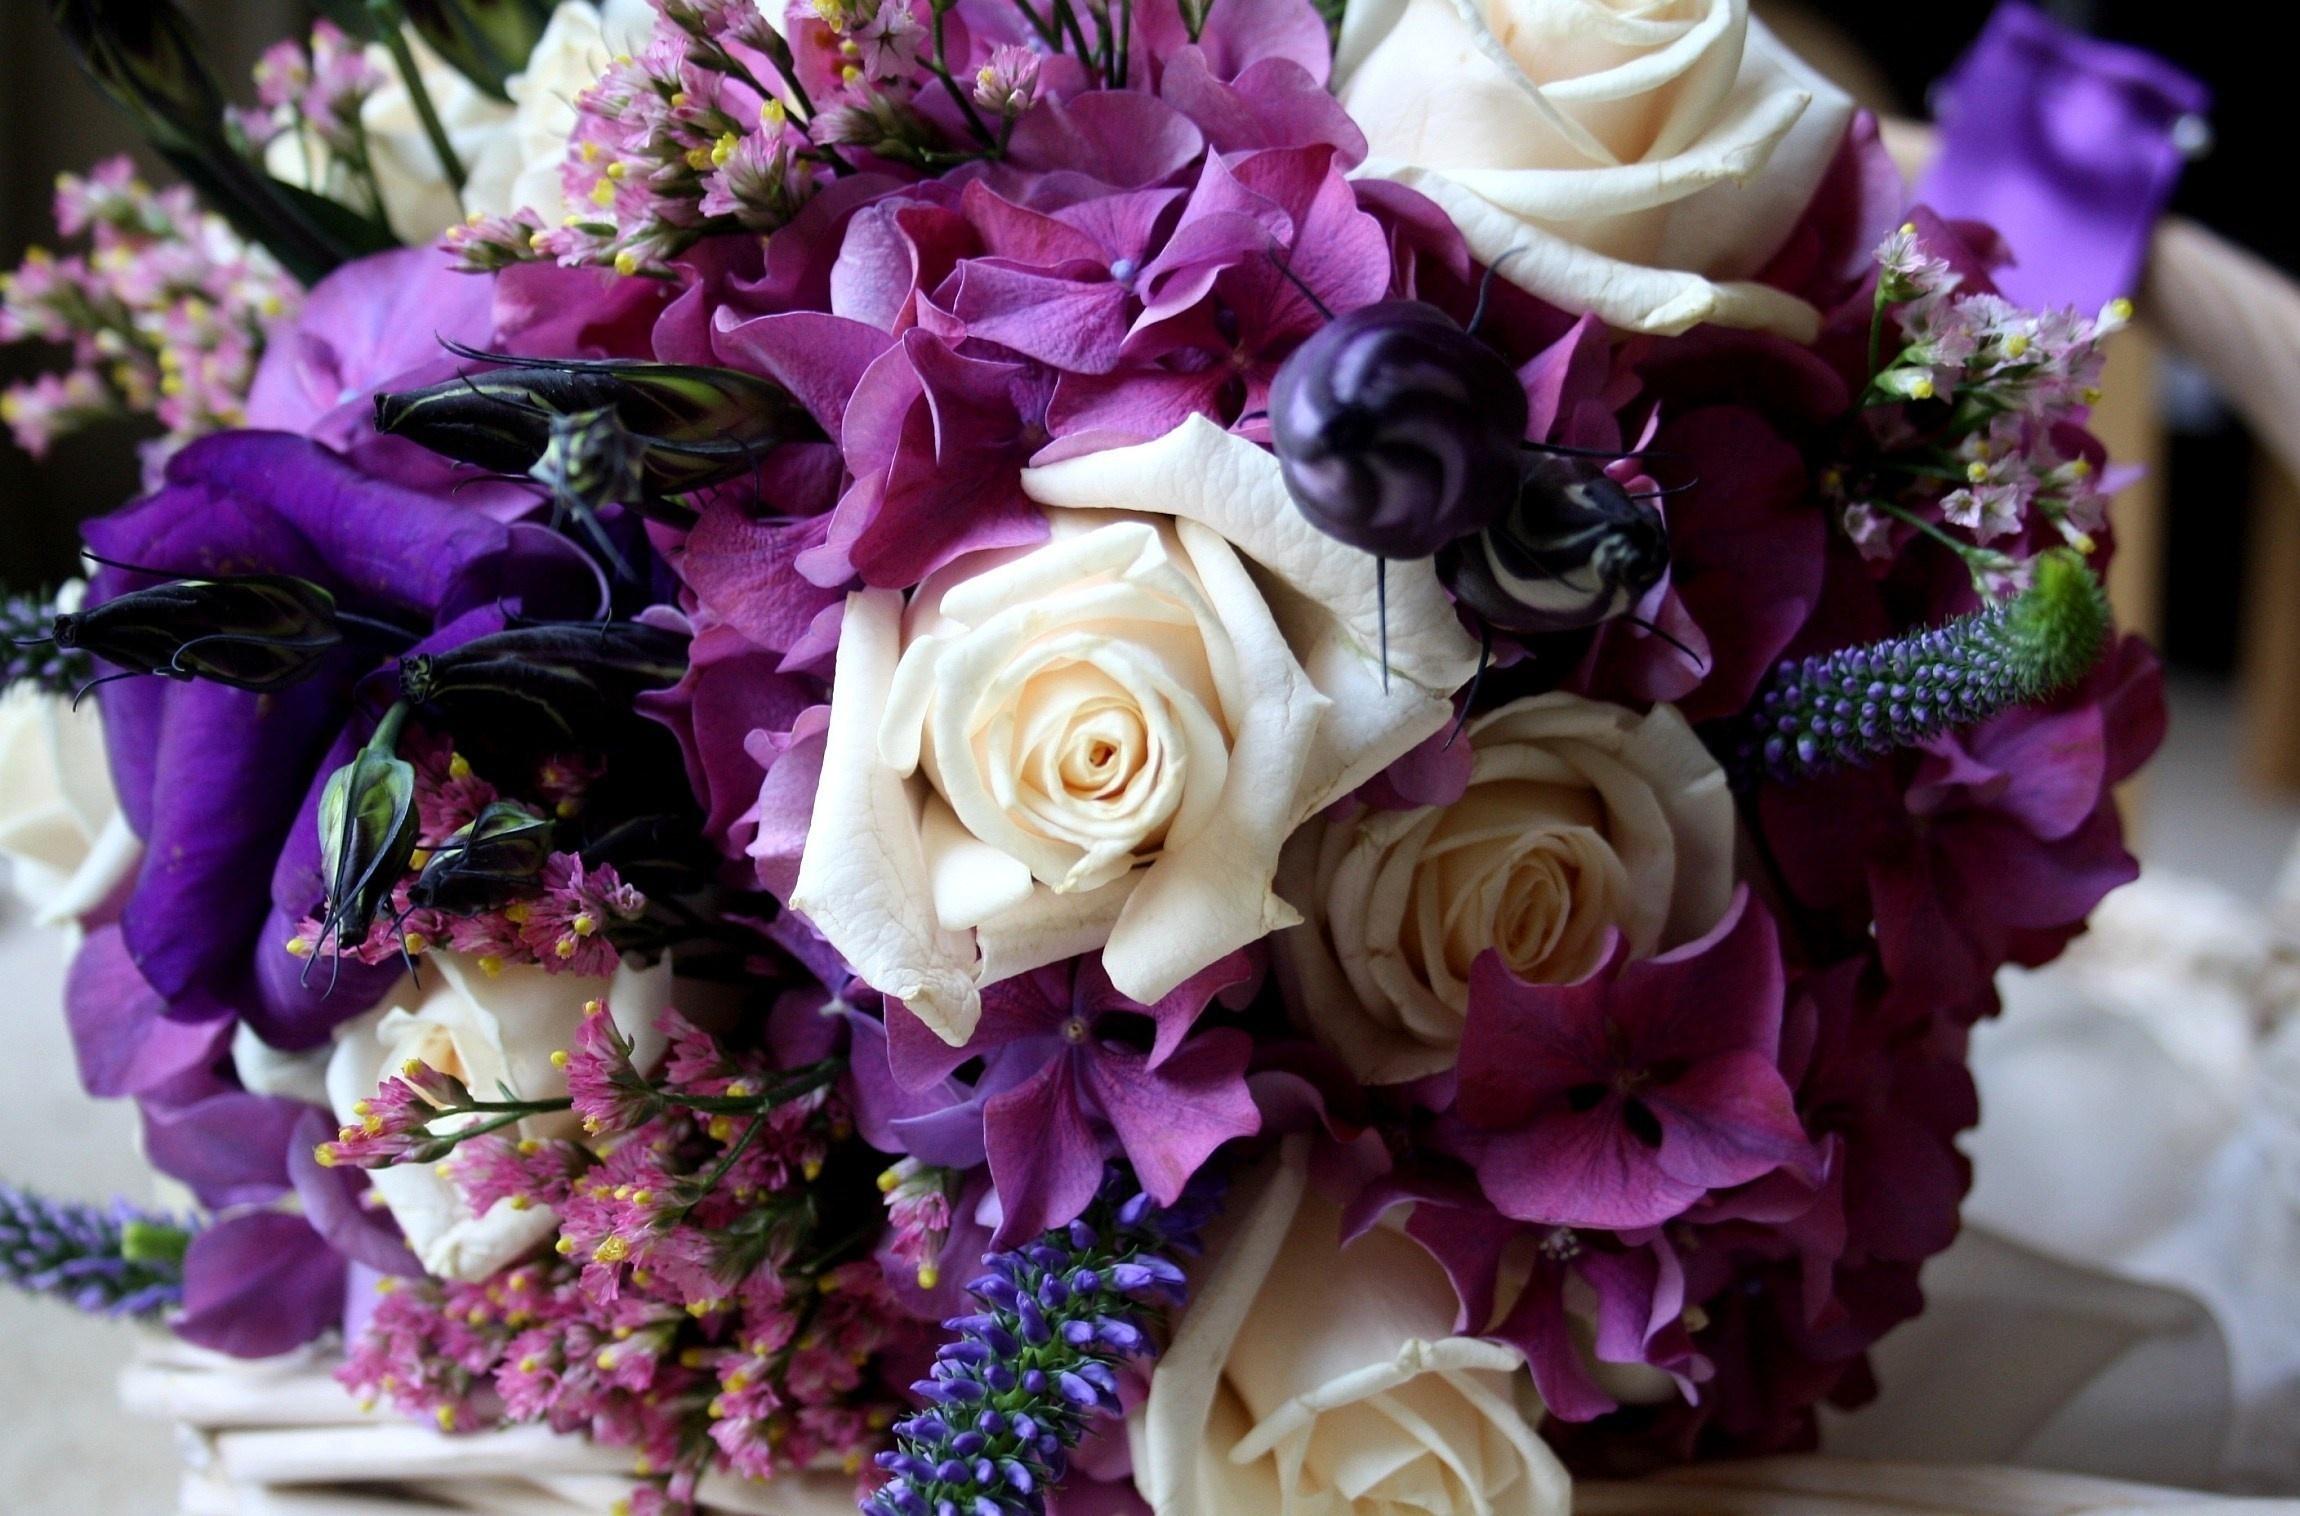 Purple Color Flower Flowers Roses Wallpaper 83784